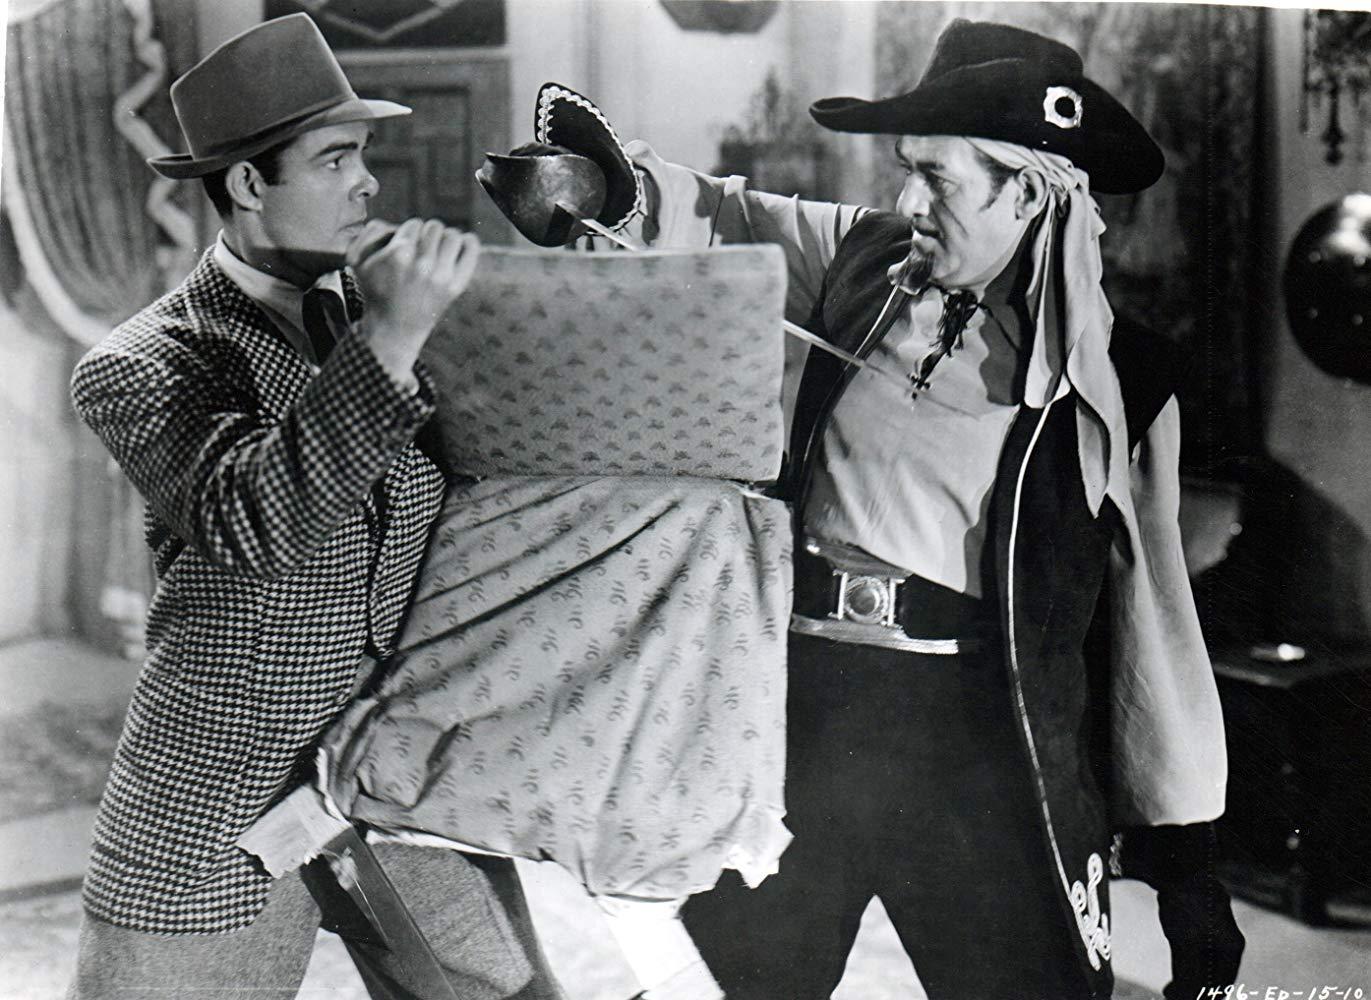 (l to r) Criminologist Lance Reardon (Richard Bailey) fights the villainous Captain Mephisto (Roy Barcroft) in Manhunt of Mystery Island (1945)